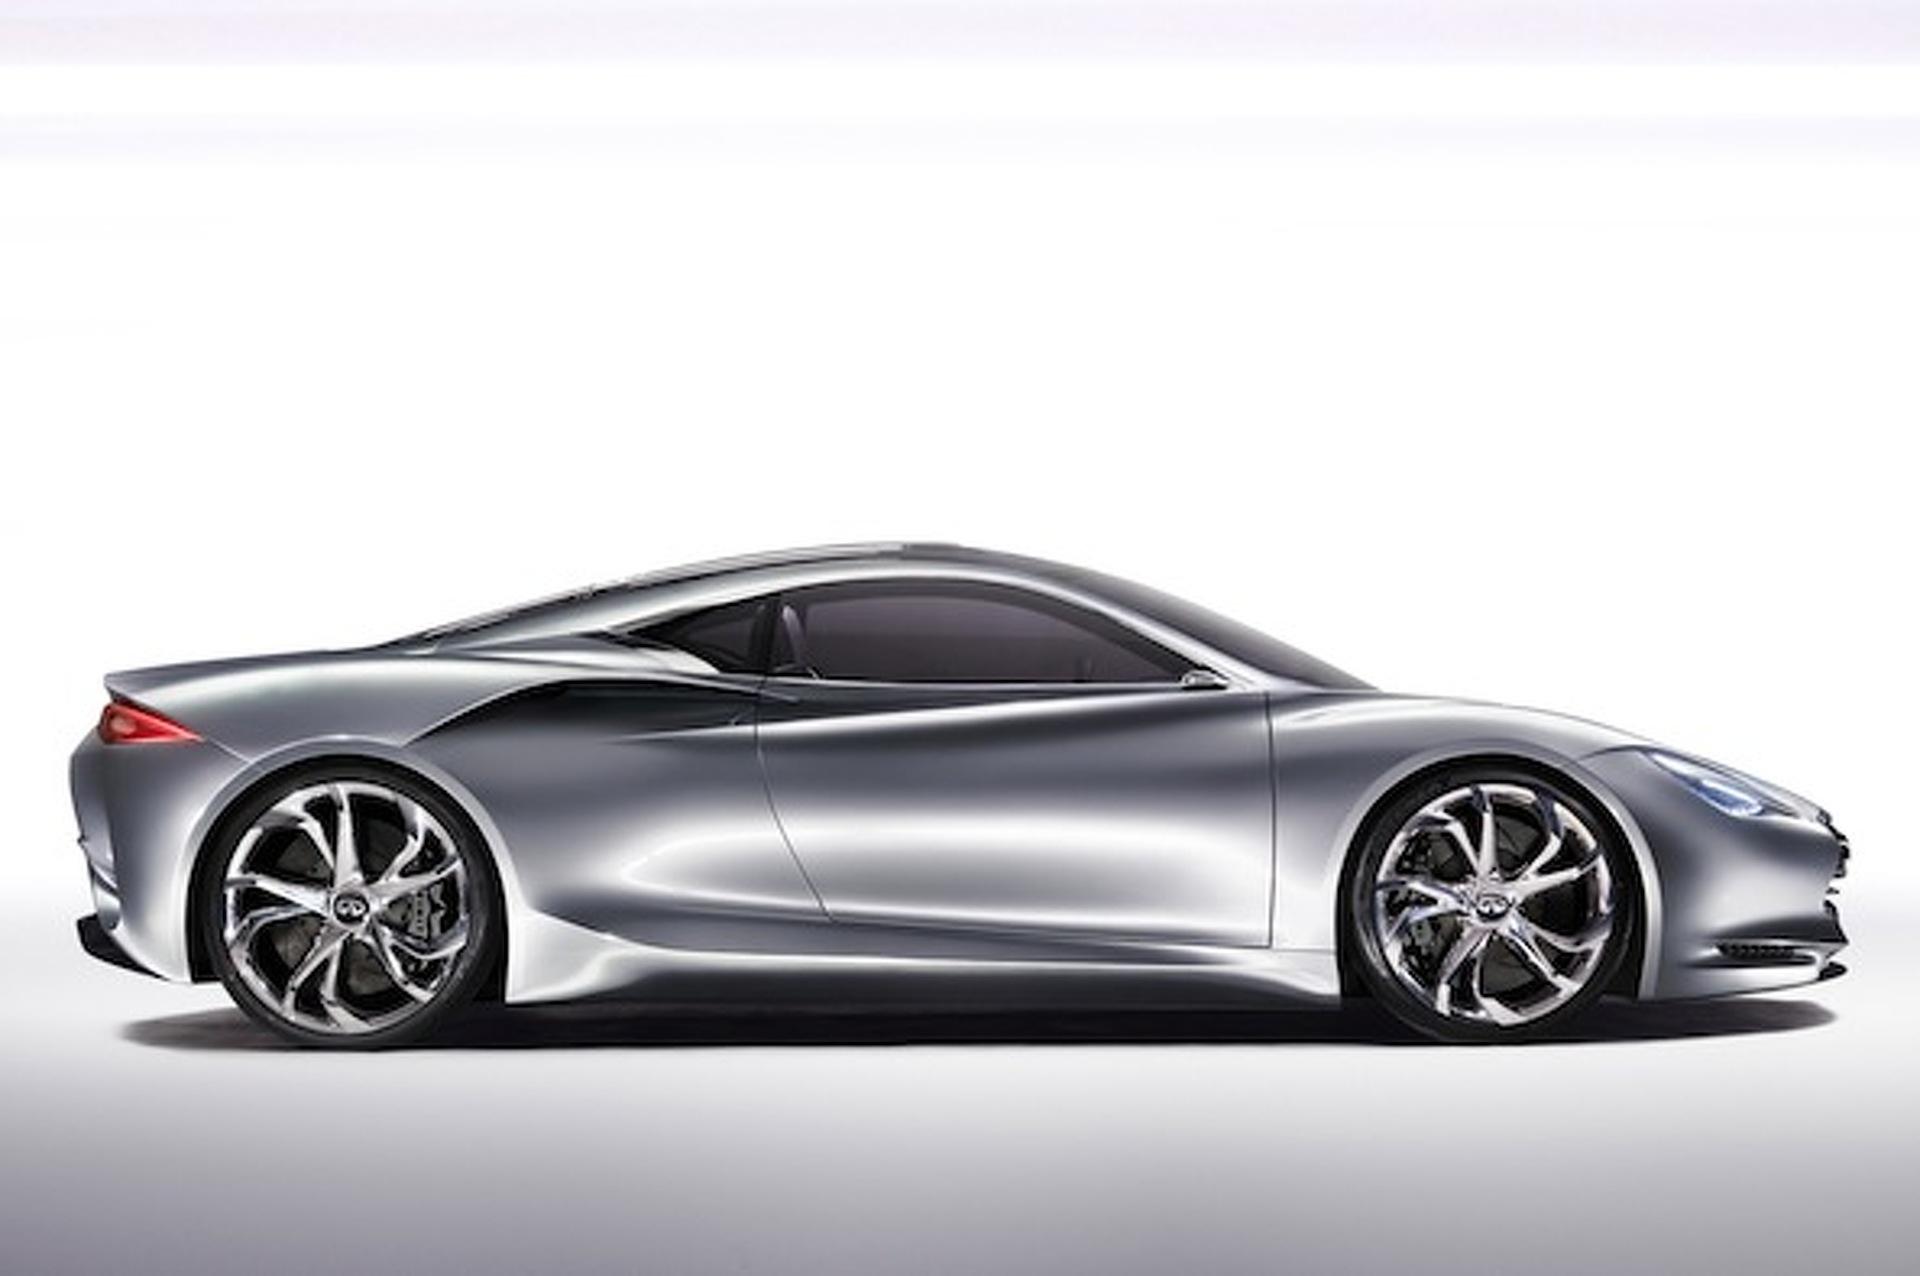 Infiniti Supercar Won't be Ready Until 2018